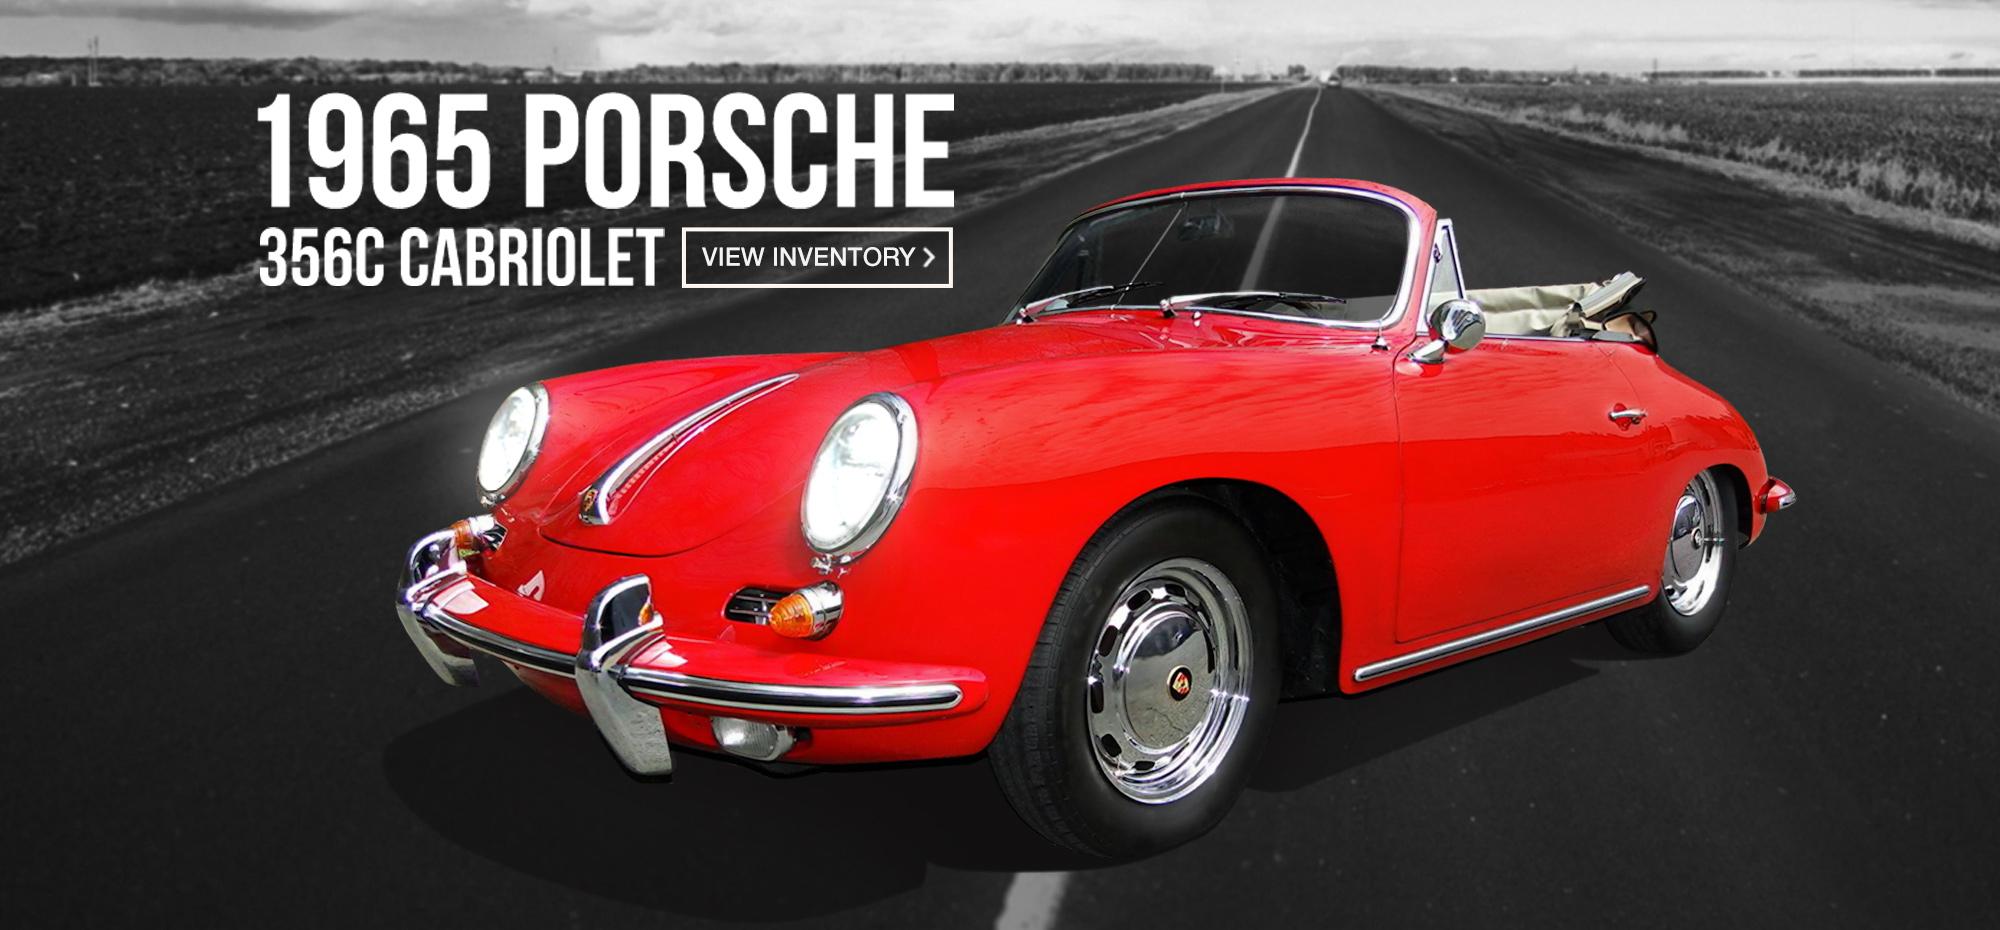 Legendary Motors - Classic Cars, Muscle Cars, Hot Rods & Antique ...